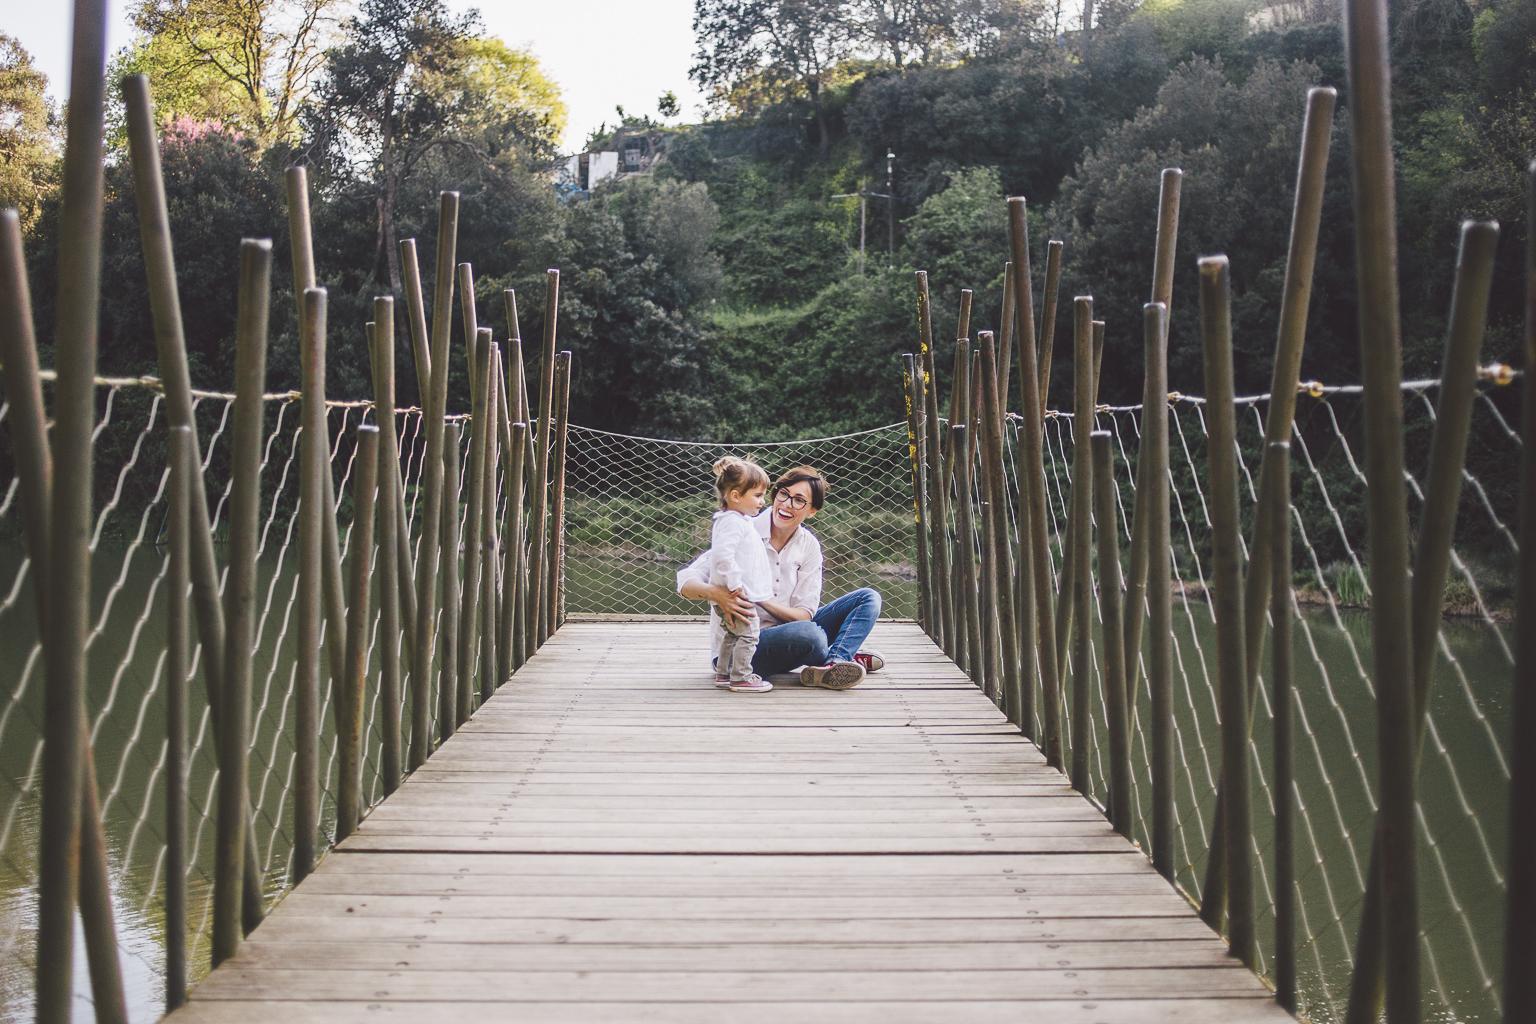 fotógrafo familia Barcelona :: Pantá de Vallvidrera :: Fotógrafo familiar :: Fotografía de familia natural  :: Fotógrafo Sant Cugat del Vallés :: Fotógrafo de familia en Sant Cugat